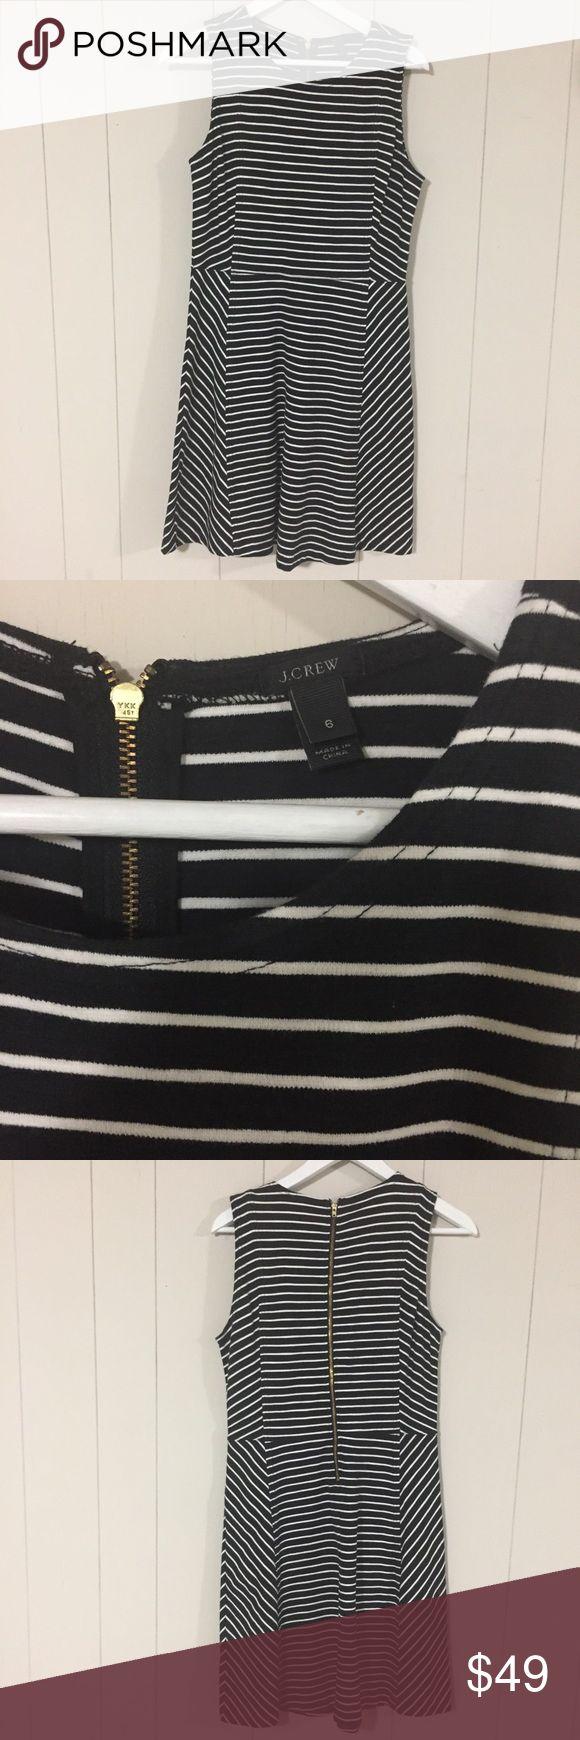 Like New J Crew Paneled Stripe Dress $138 Size 6 In Black and White. A classic wardrobe staple! Own it, wear it, Rock it! J. Crew Dresses